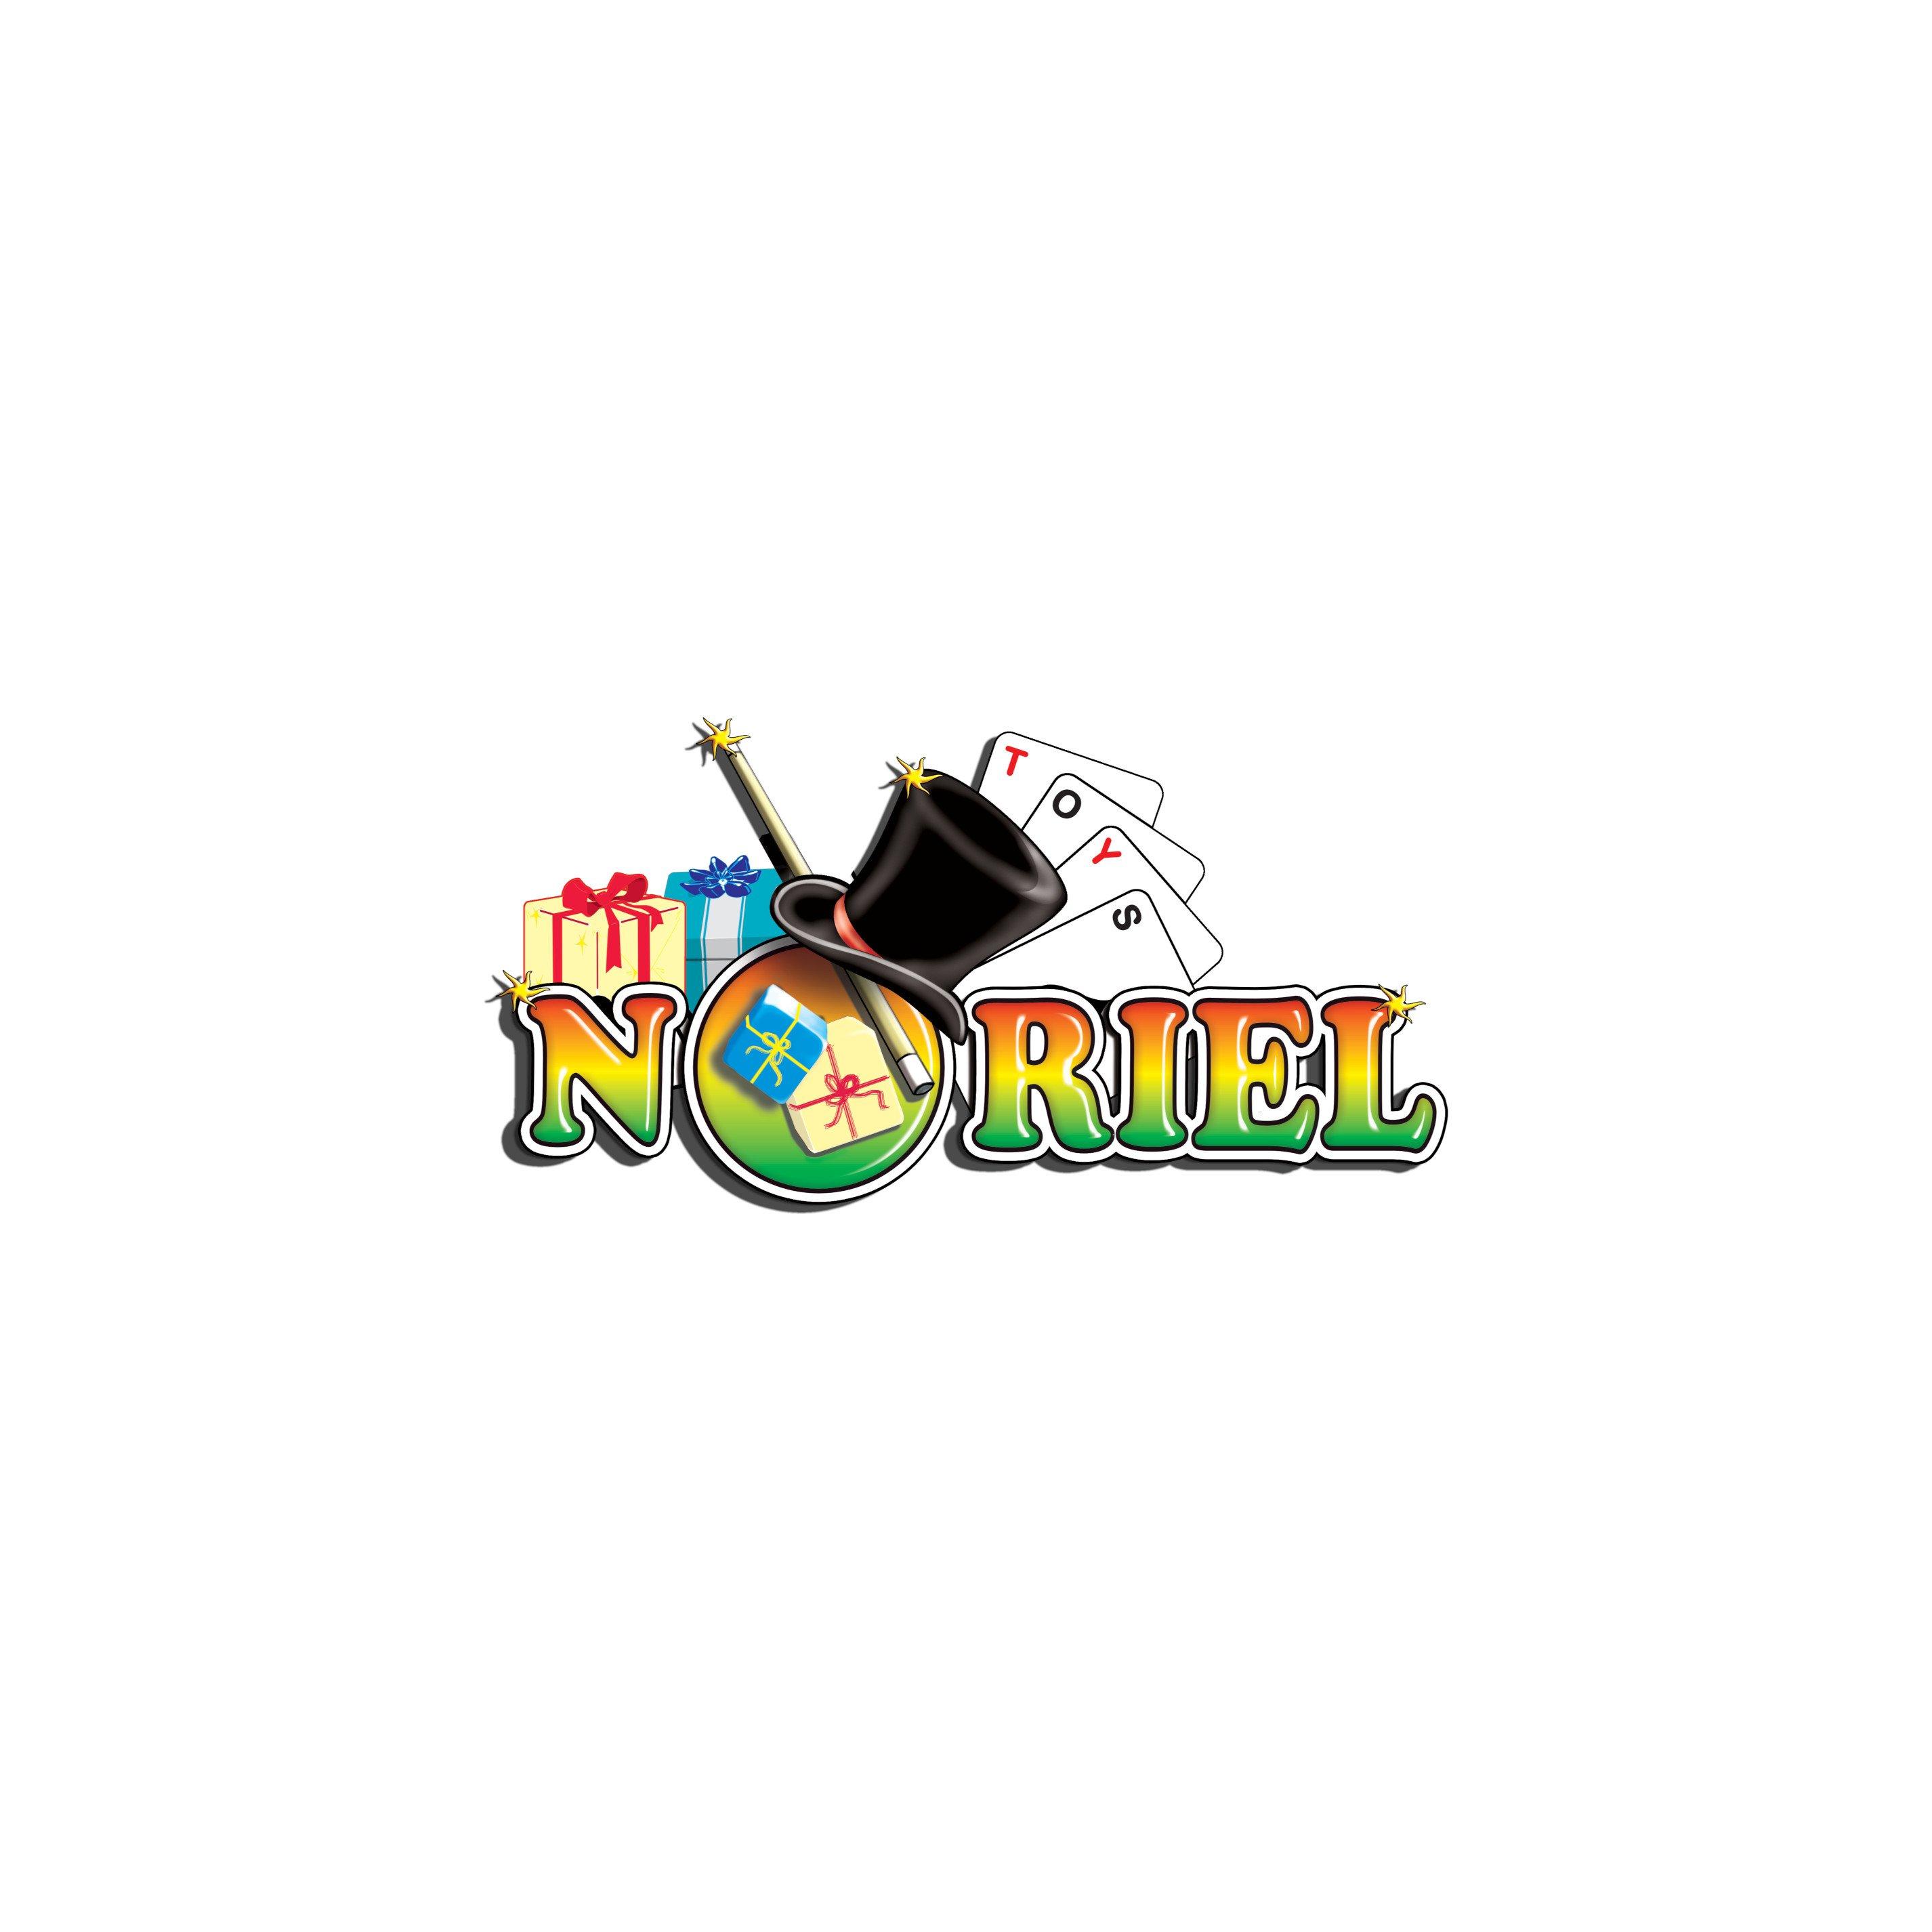 19958_001w Baloane de umflat Oonies, Rainbow Fantasy, S4